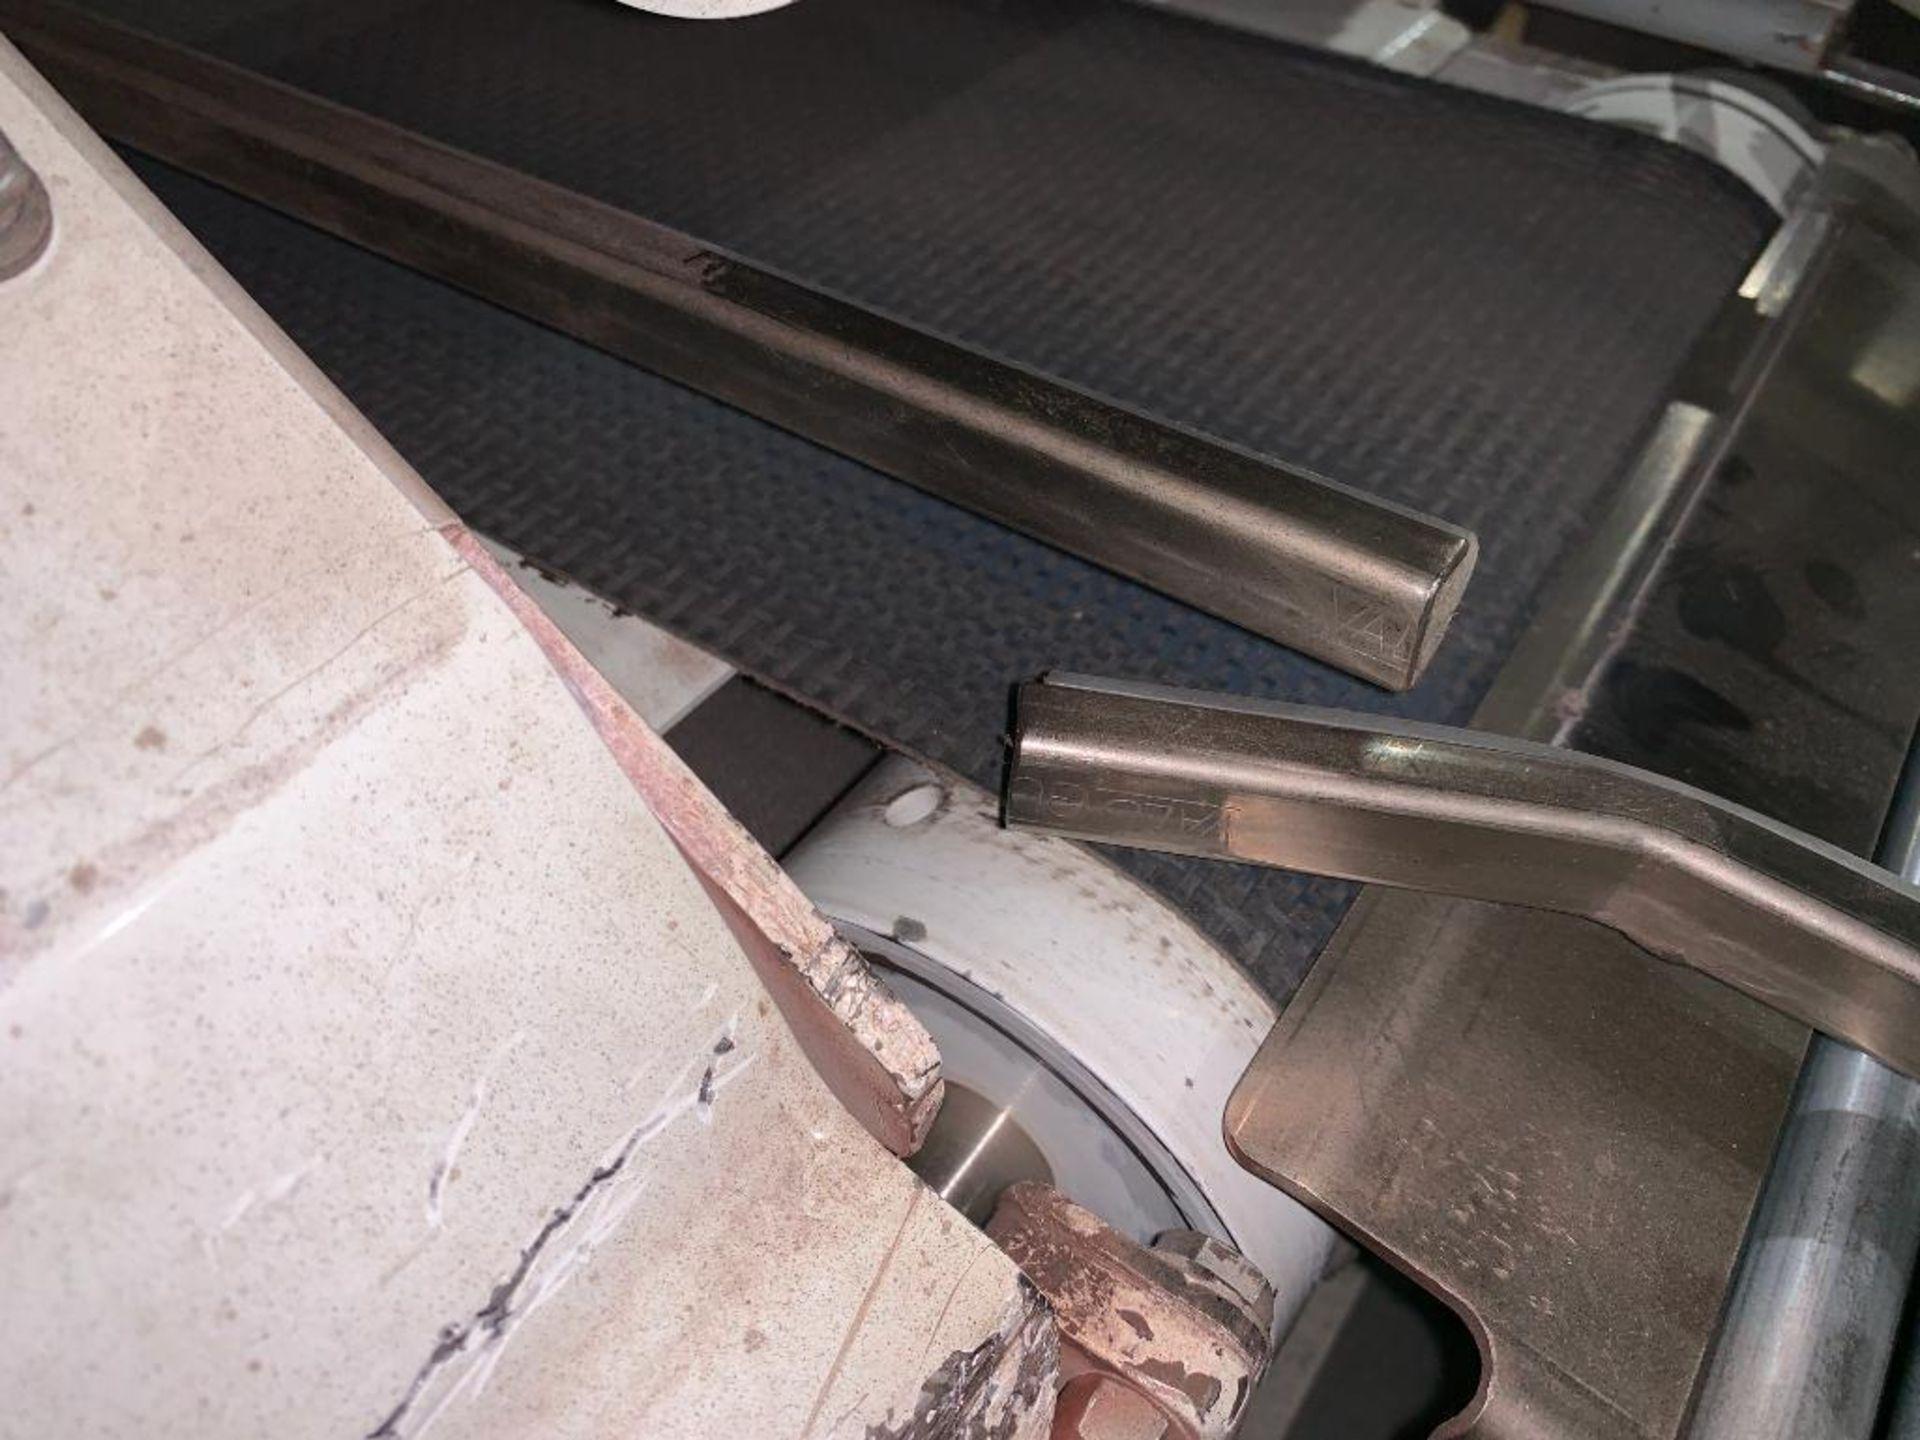 mild steel belt conveyor, 68 in. x 10 in., with box conditioner - Image 9 of 13